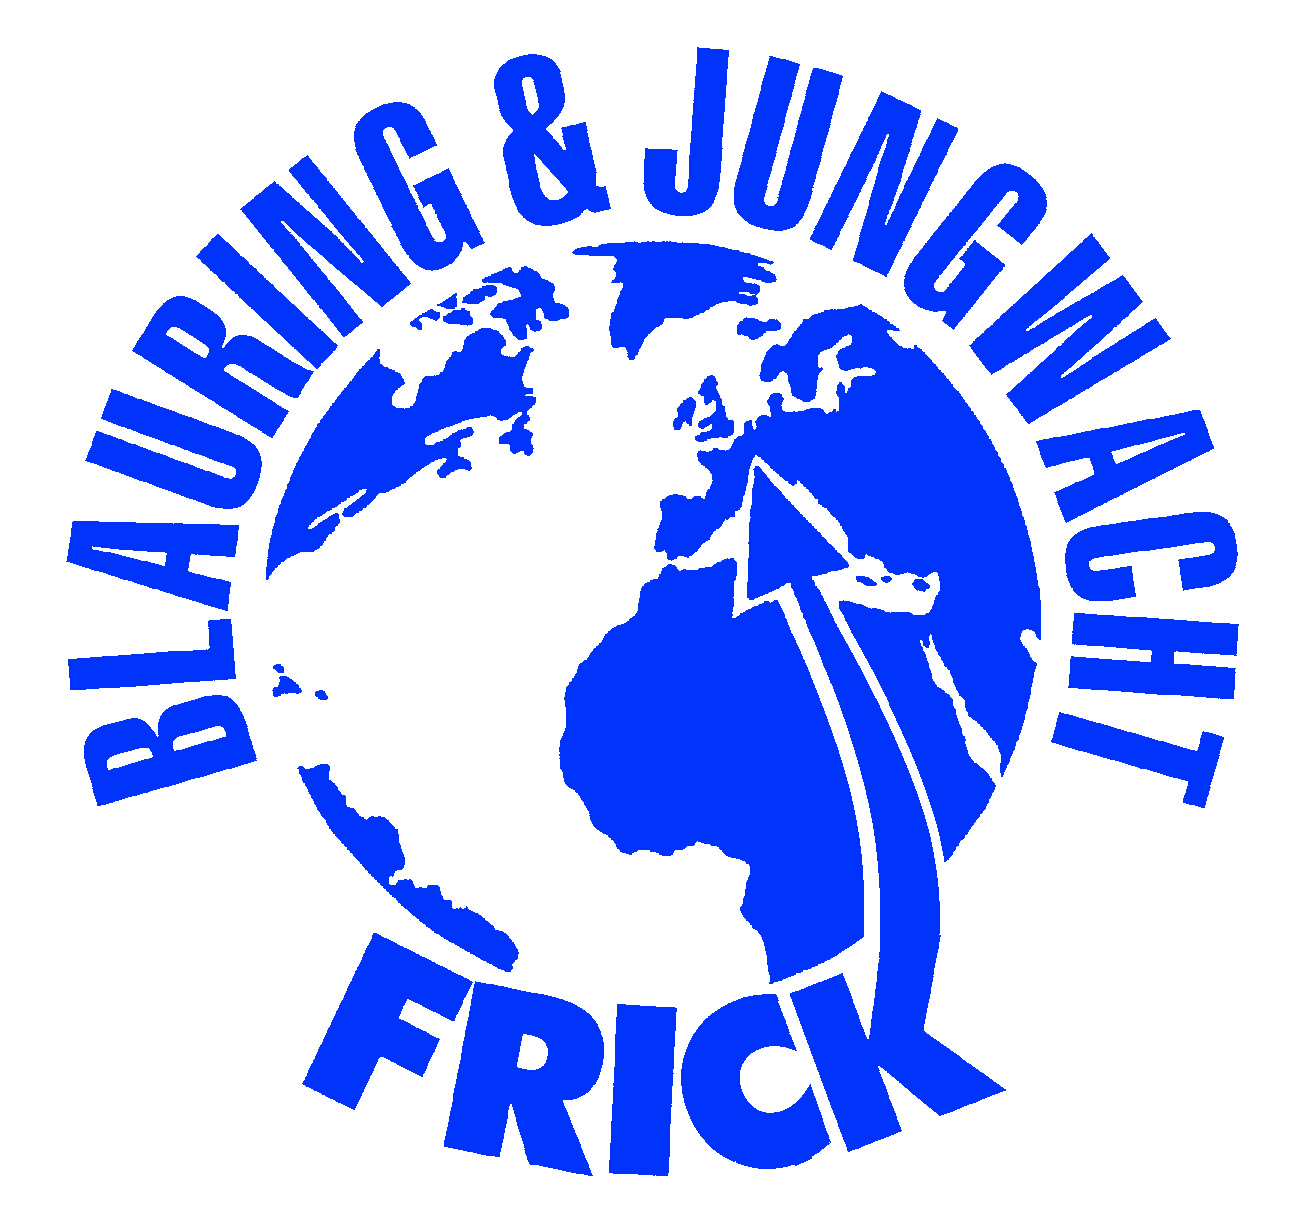 Jungwacht & Blauring Frick